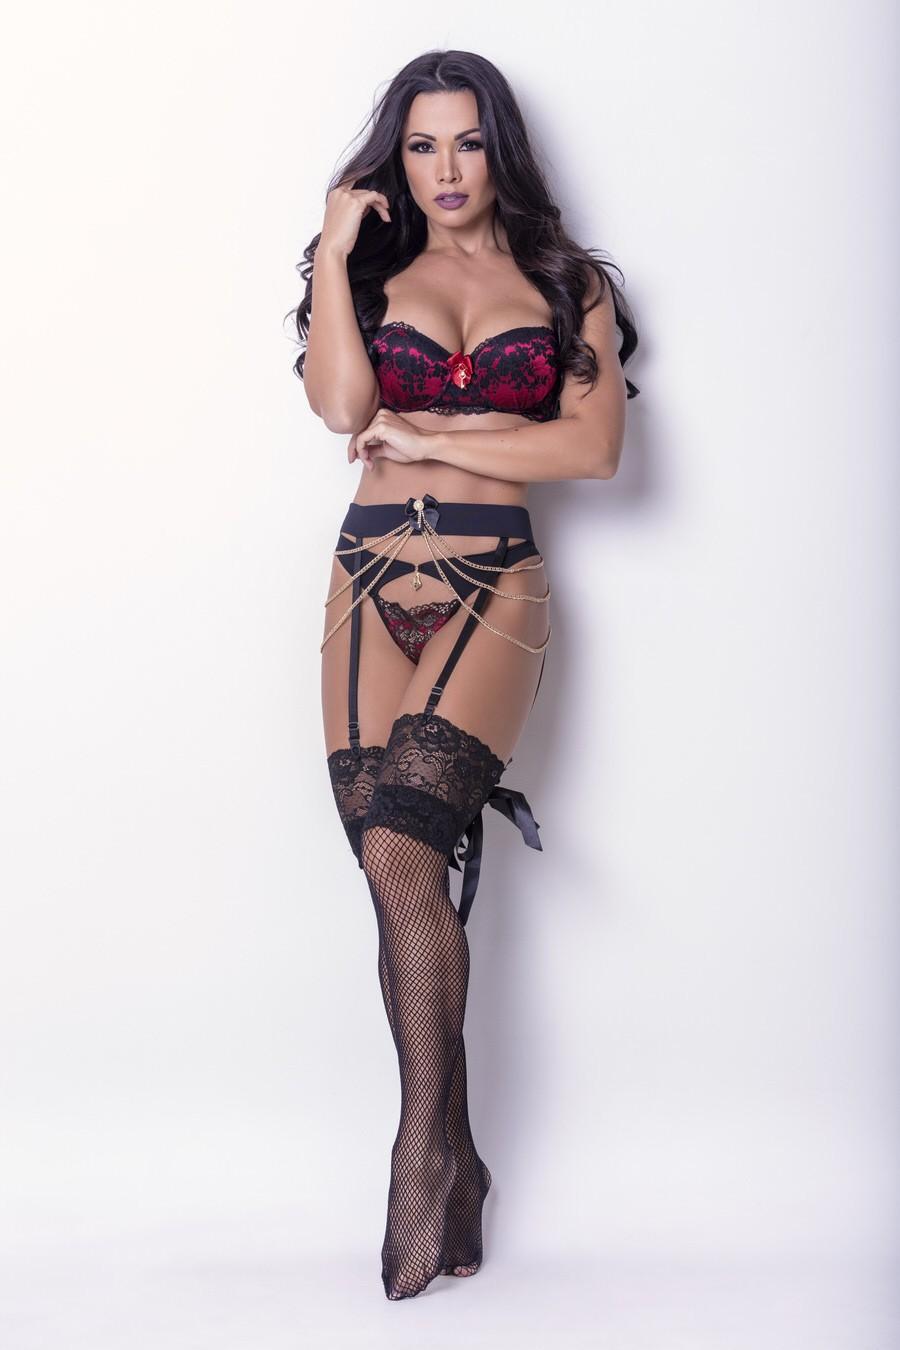 Fernanda D'avila é nova garota propaganda de marca de lingerie (Foto: Rogério Tonello / MF Press Global)